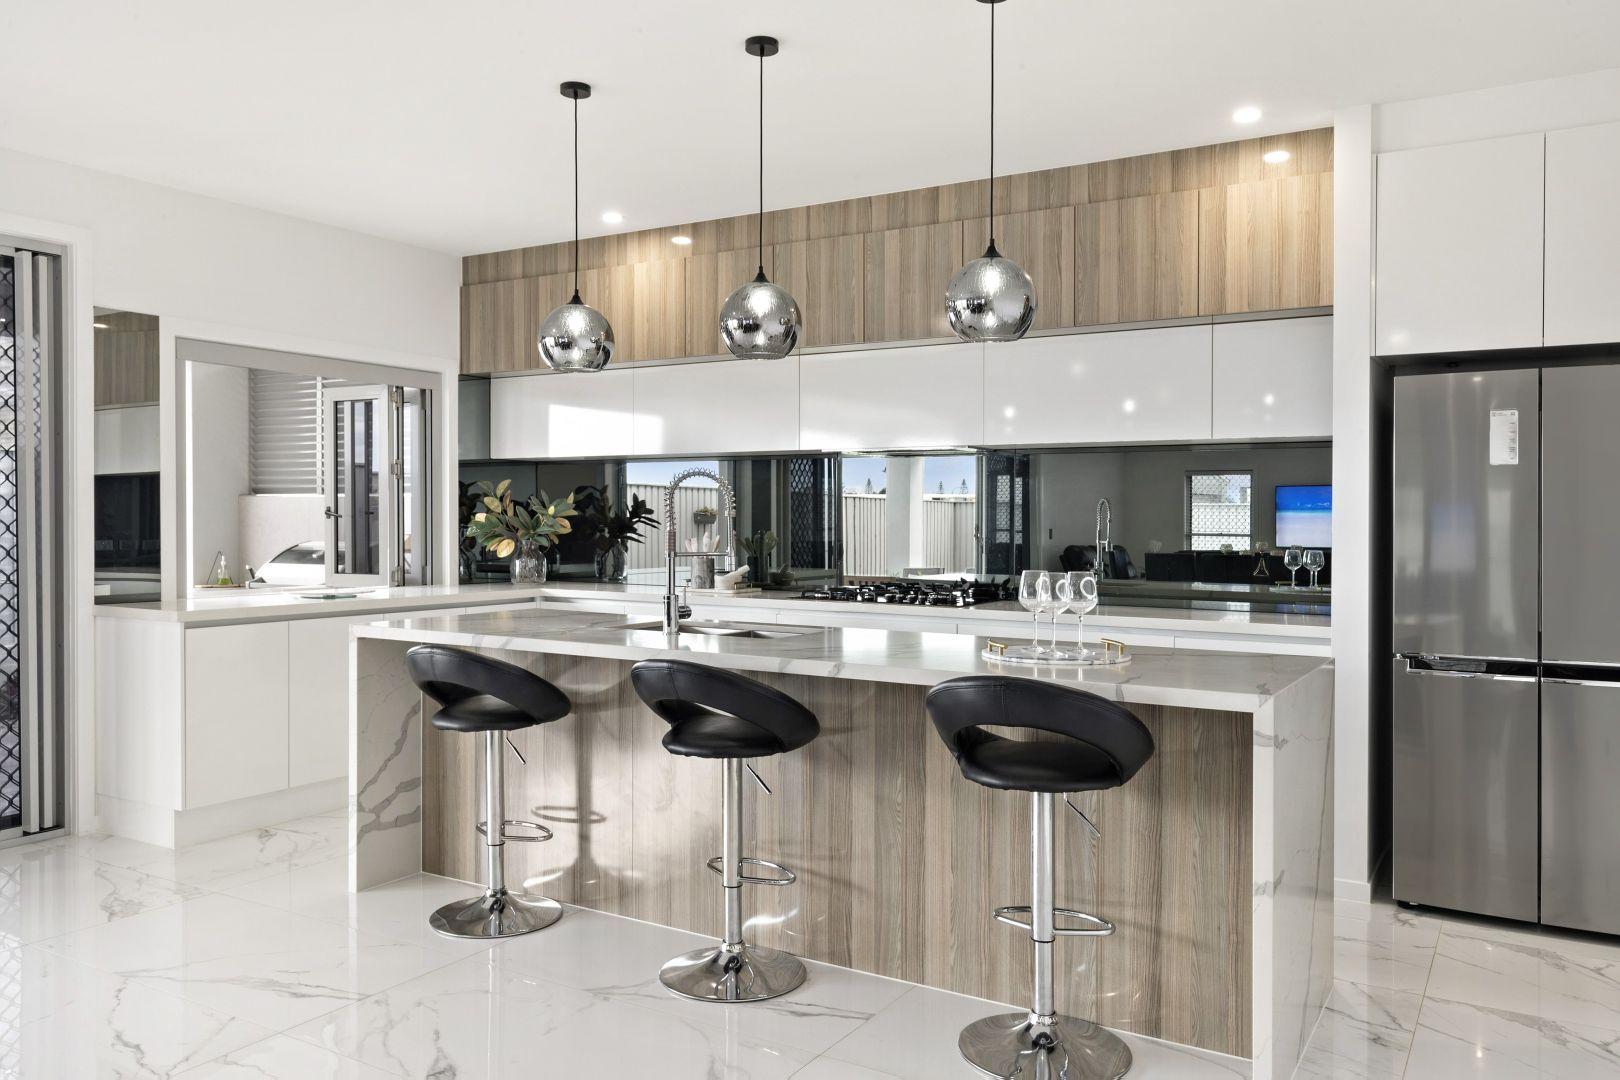 59 Lakeview  Promenade, Newport QLD 4020, Image 2